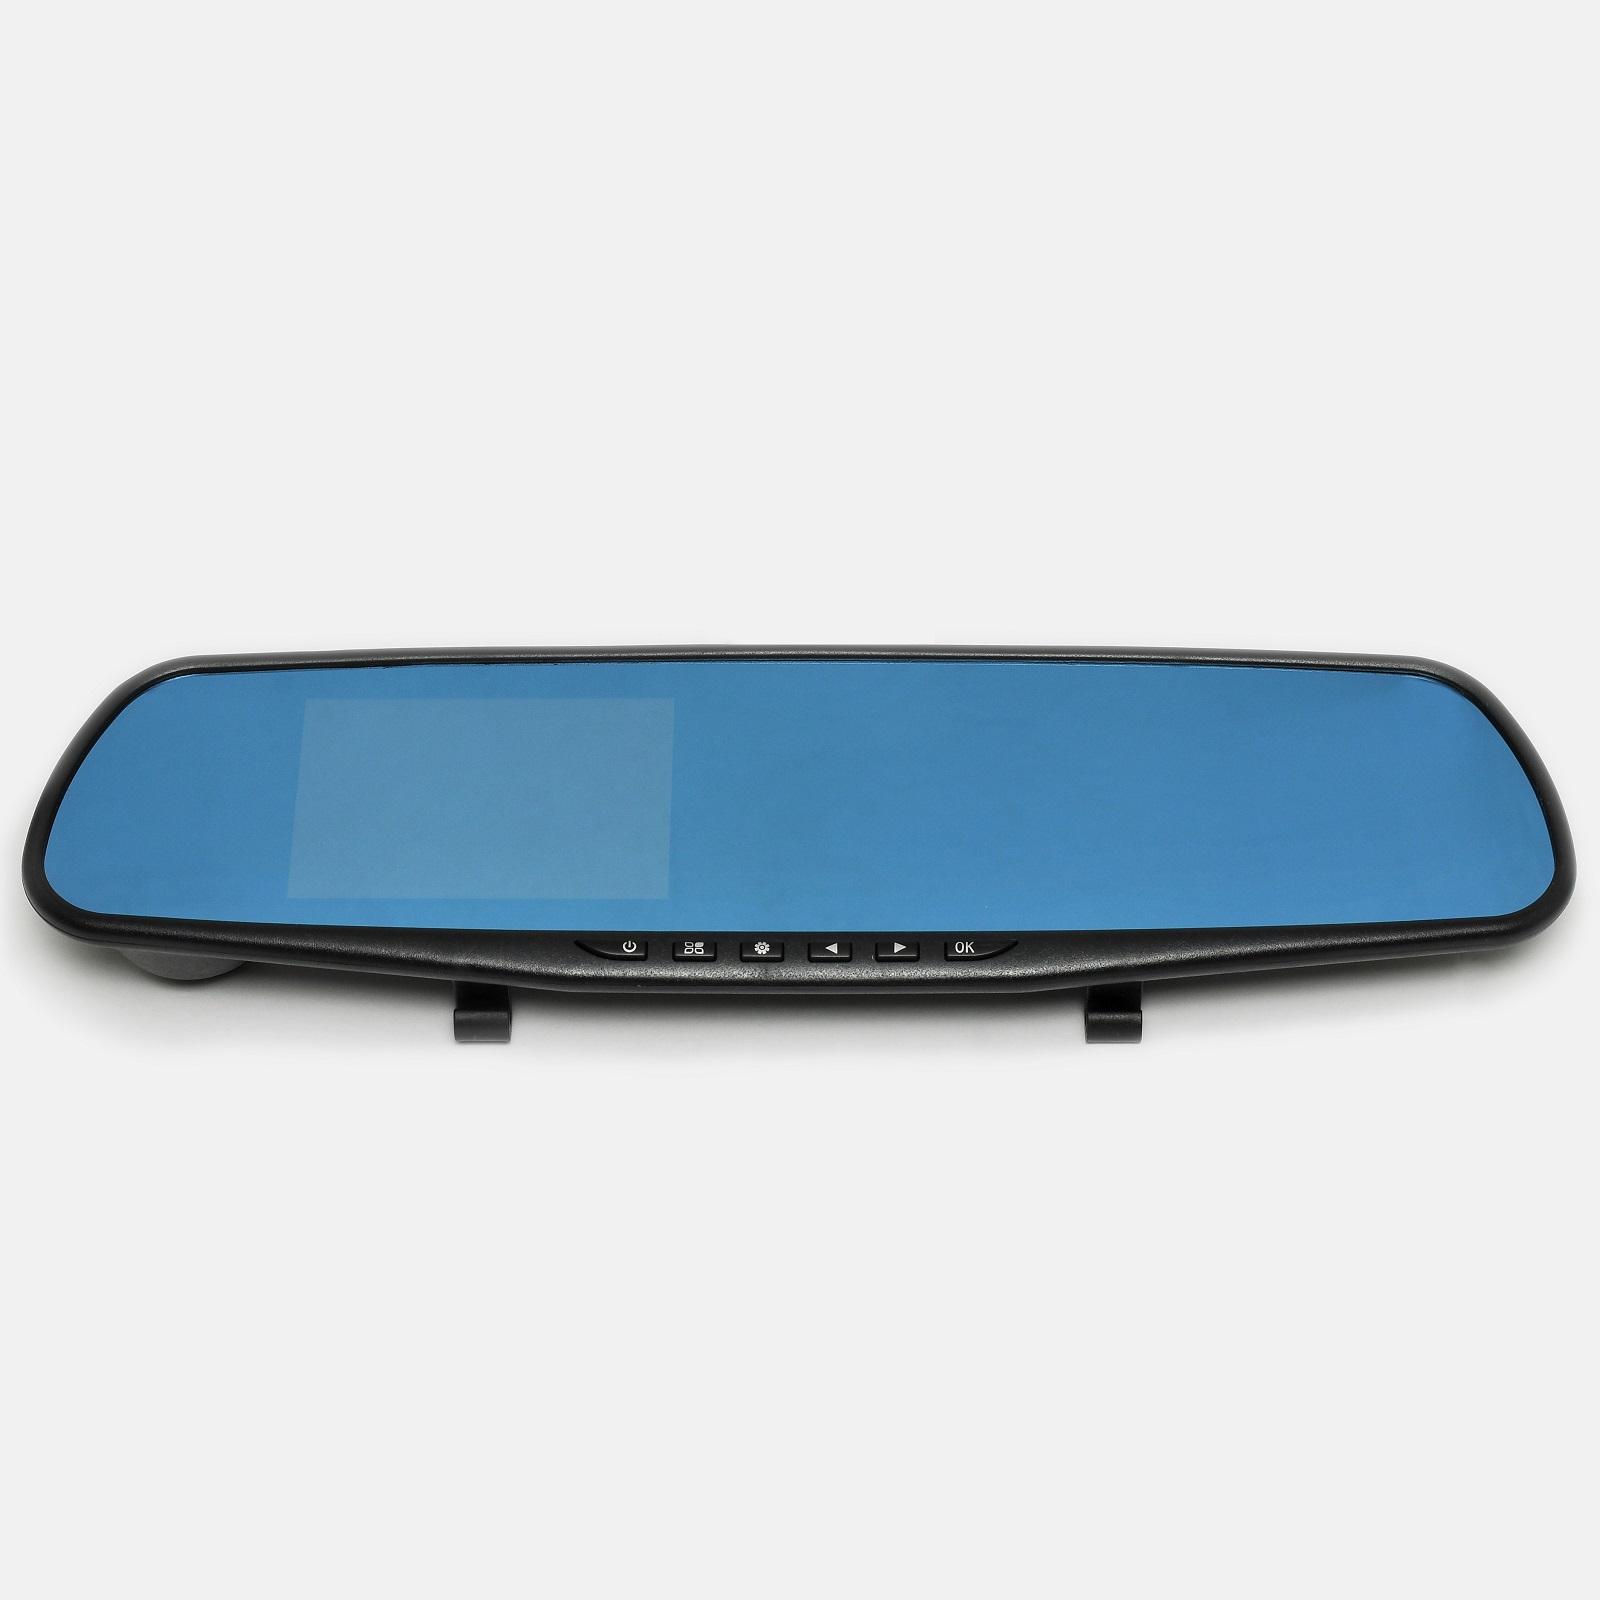 Видеорегистратор зеркало заднего вида Vehicle BlackBox Full HD 1080P, 1 камера